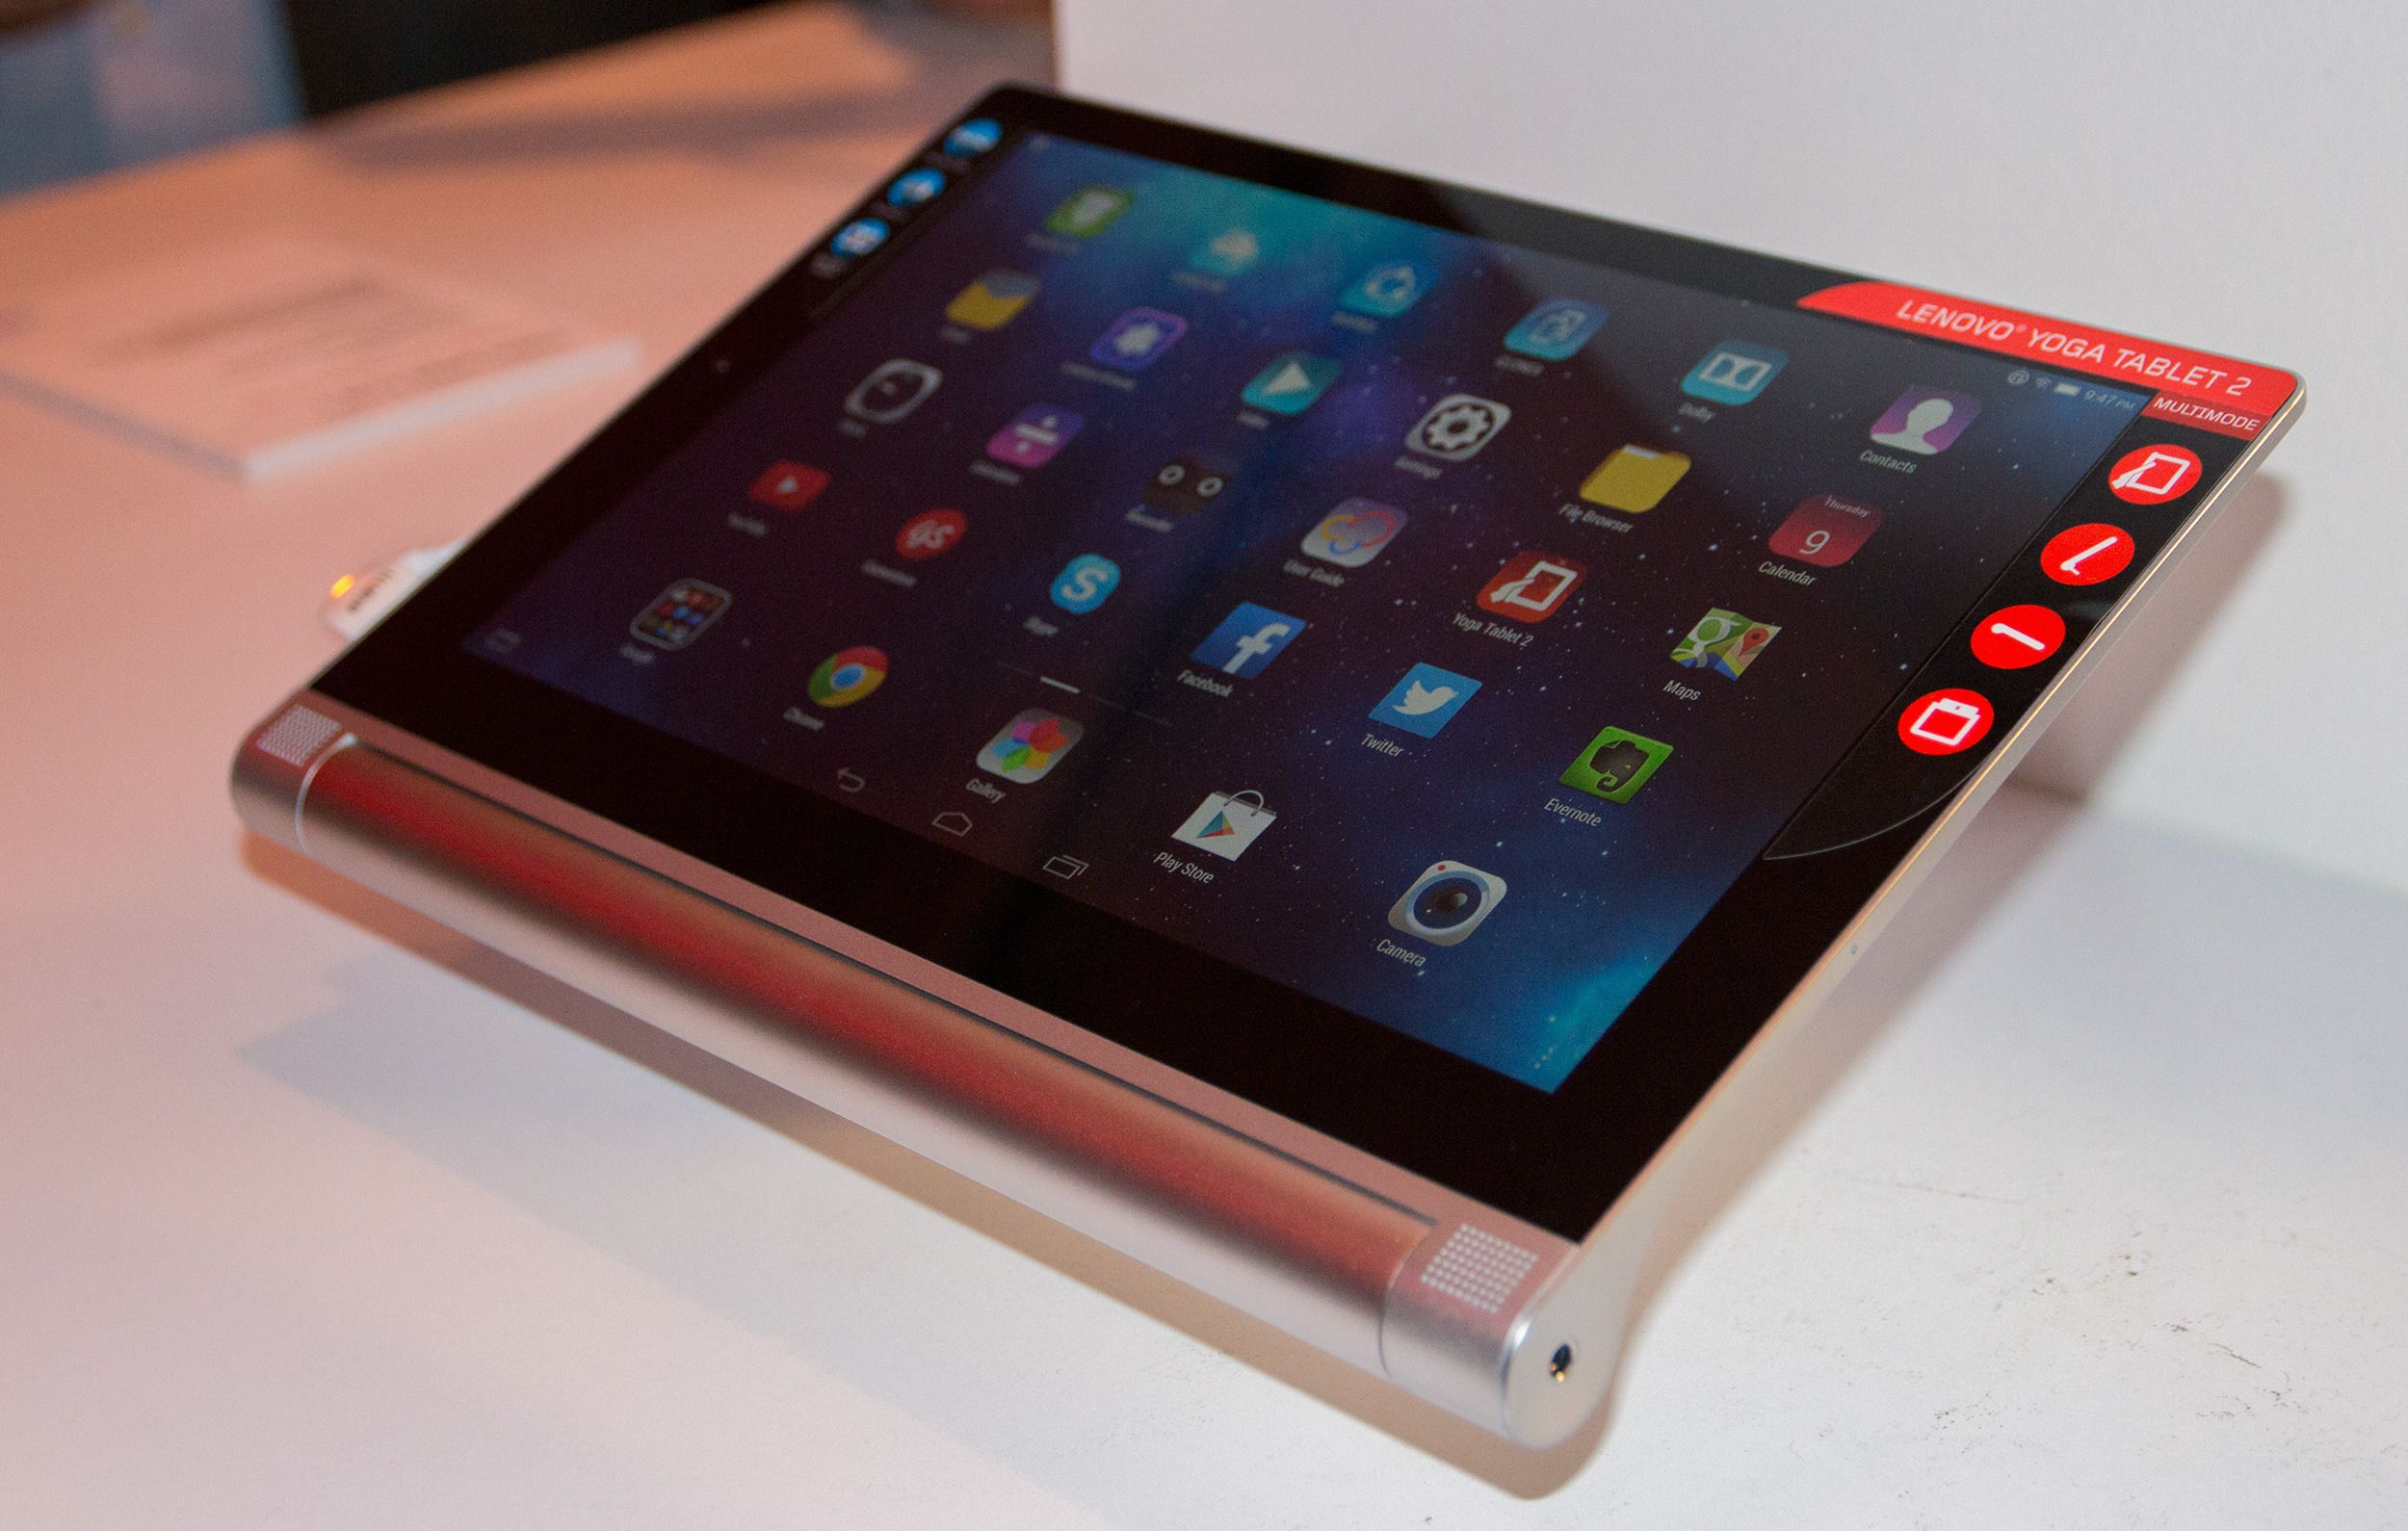 Lenovo Yoga Tablet 2 Foto: Anders Brattensborg Smedsrud, Tek.no